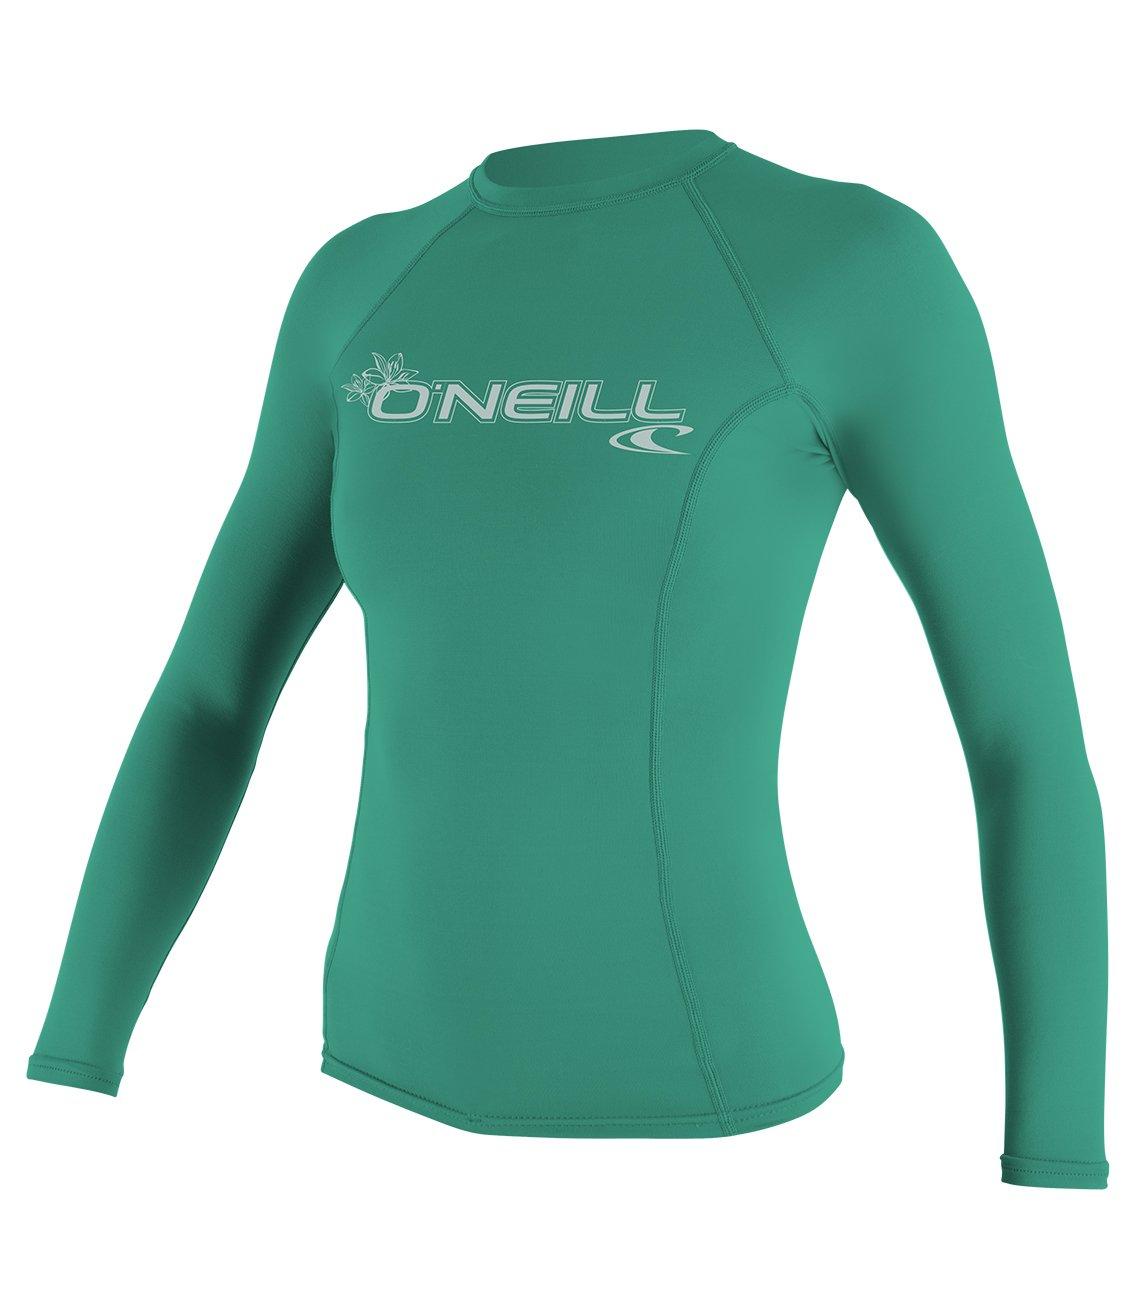 O'Neill Wetsuits UV Sun Protection Womens Basic Skins Long Sleeve Crew Sun Shirt Rash Guard, Seaglass, X-Small